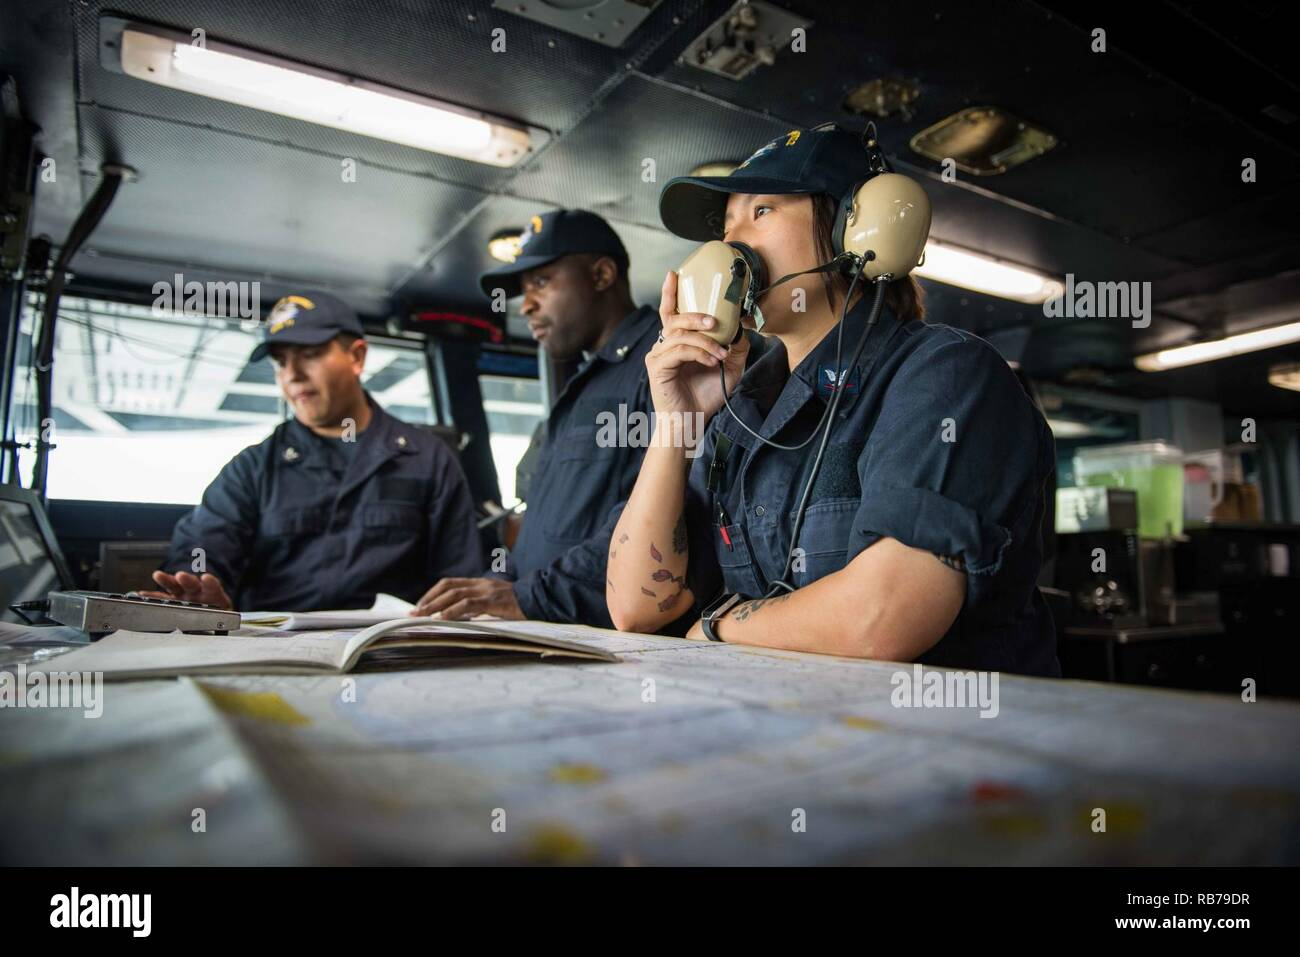 SAN DIEGO (Dec  15, 2016) Petty Officer 3rd Class Kimberley